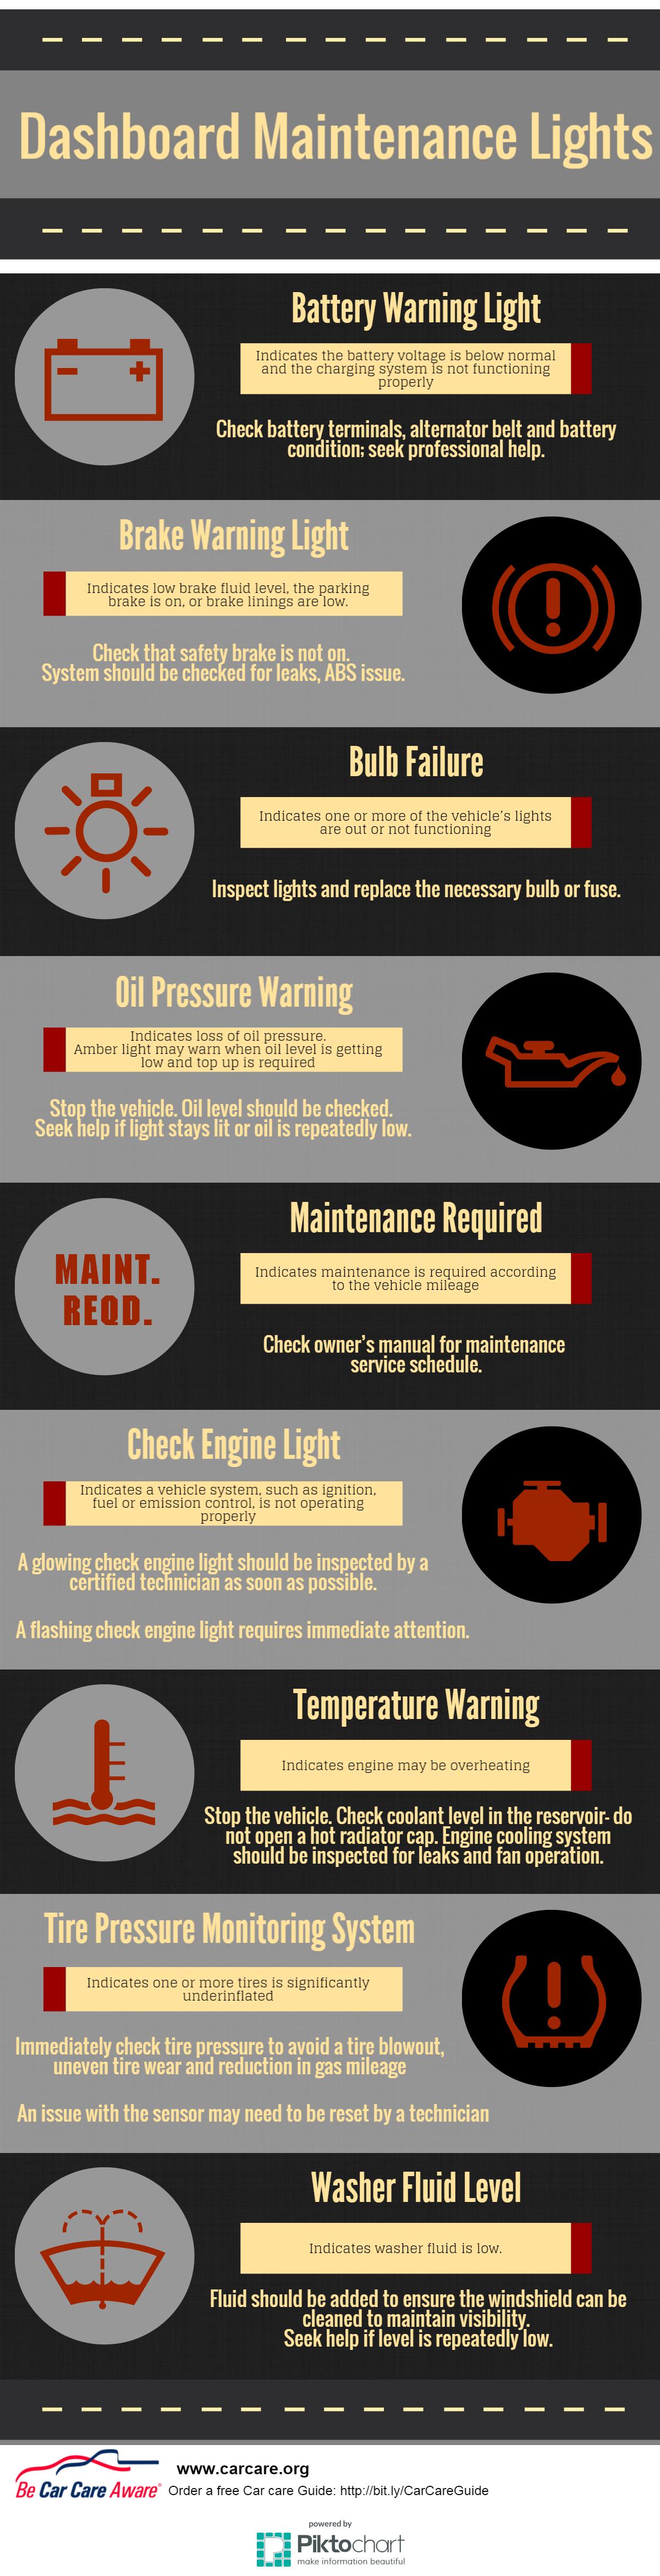 Boston_Auto_Repair_Check_Engine_Light